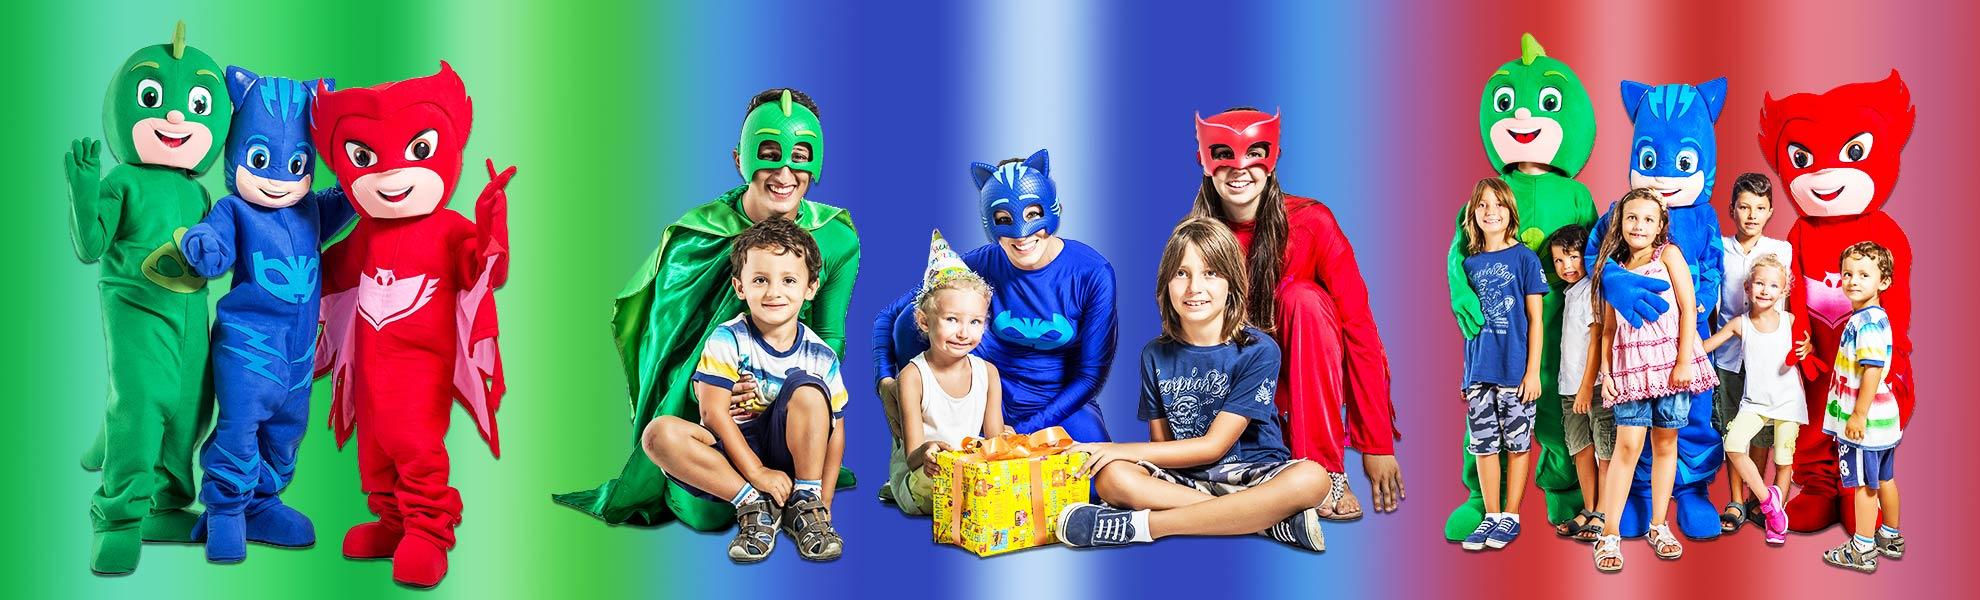 Festa compleanno PJ-Mask Super pigiamini